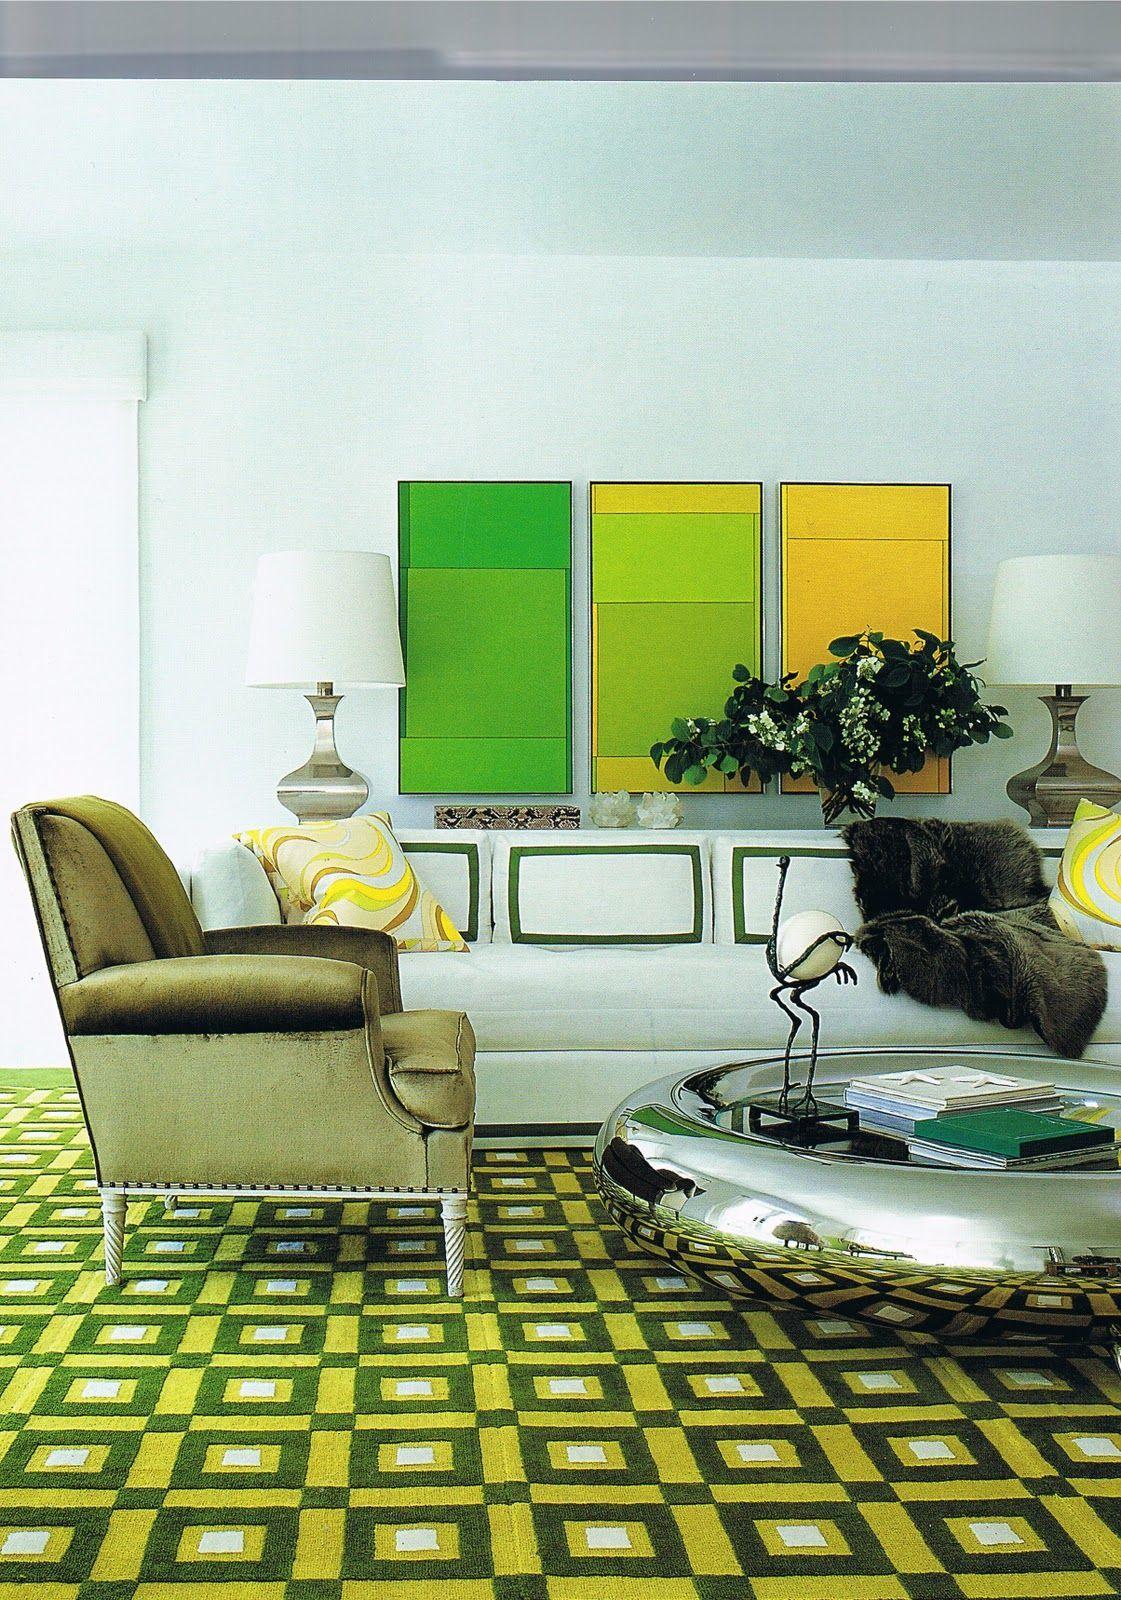 Round Carpet Green Luxury Carpet Home Retro Carpet Pattern Bluecarpettopview In 2020 Geometric Carpet Decor Colorful Interiors